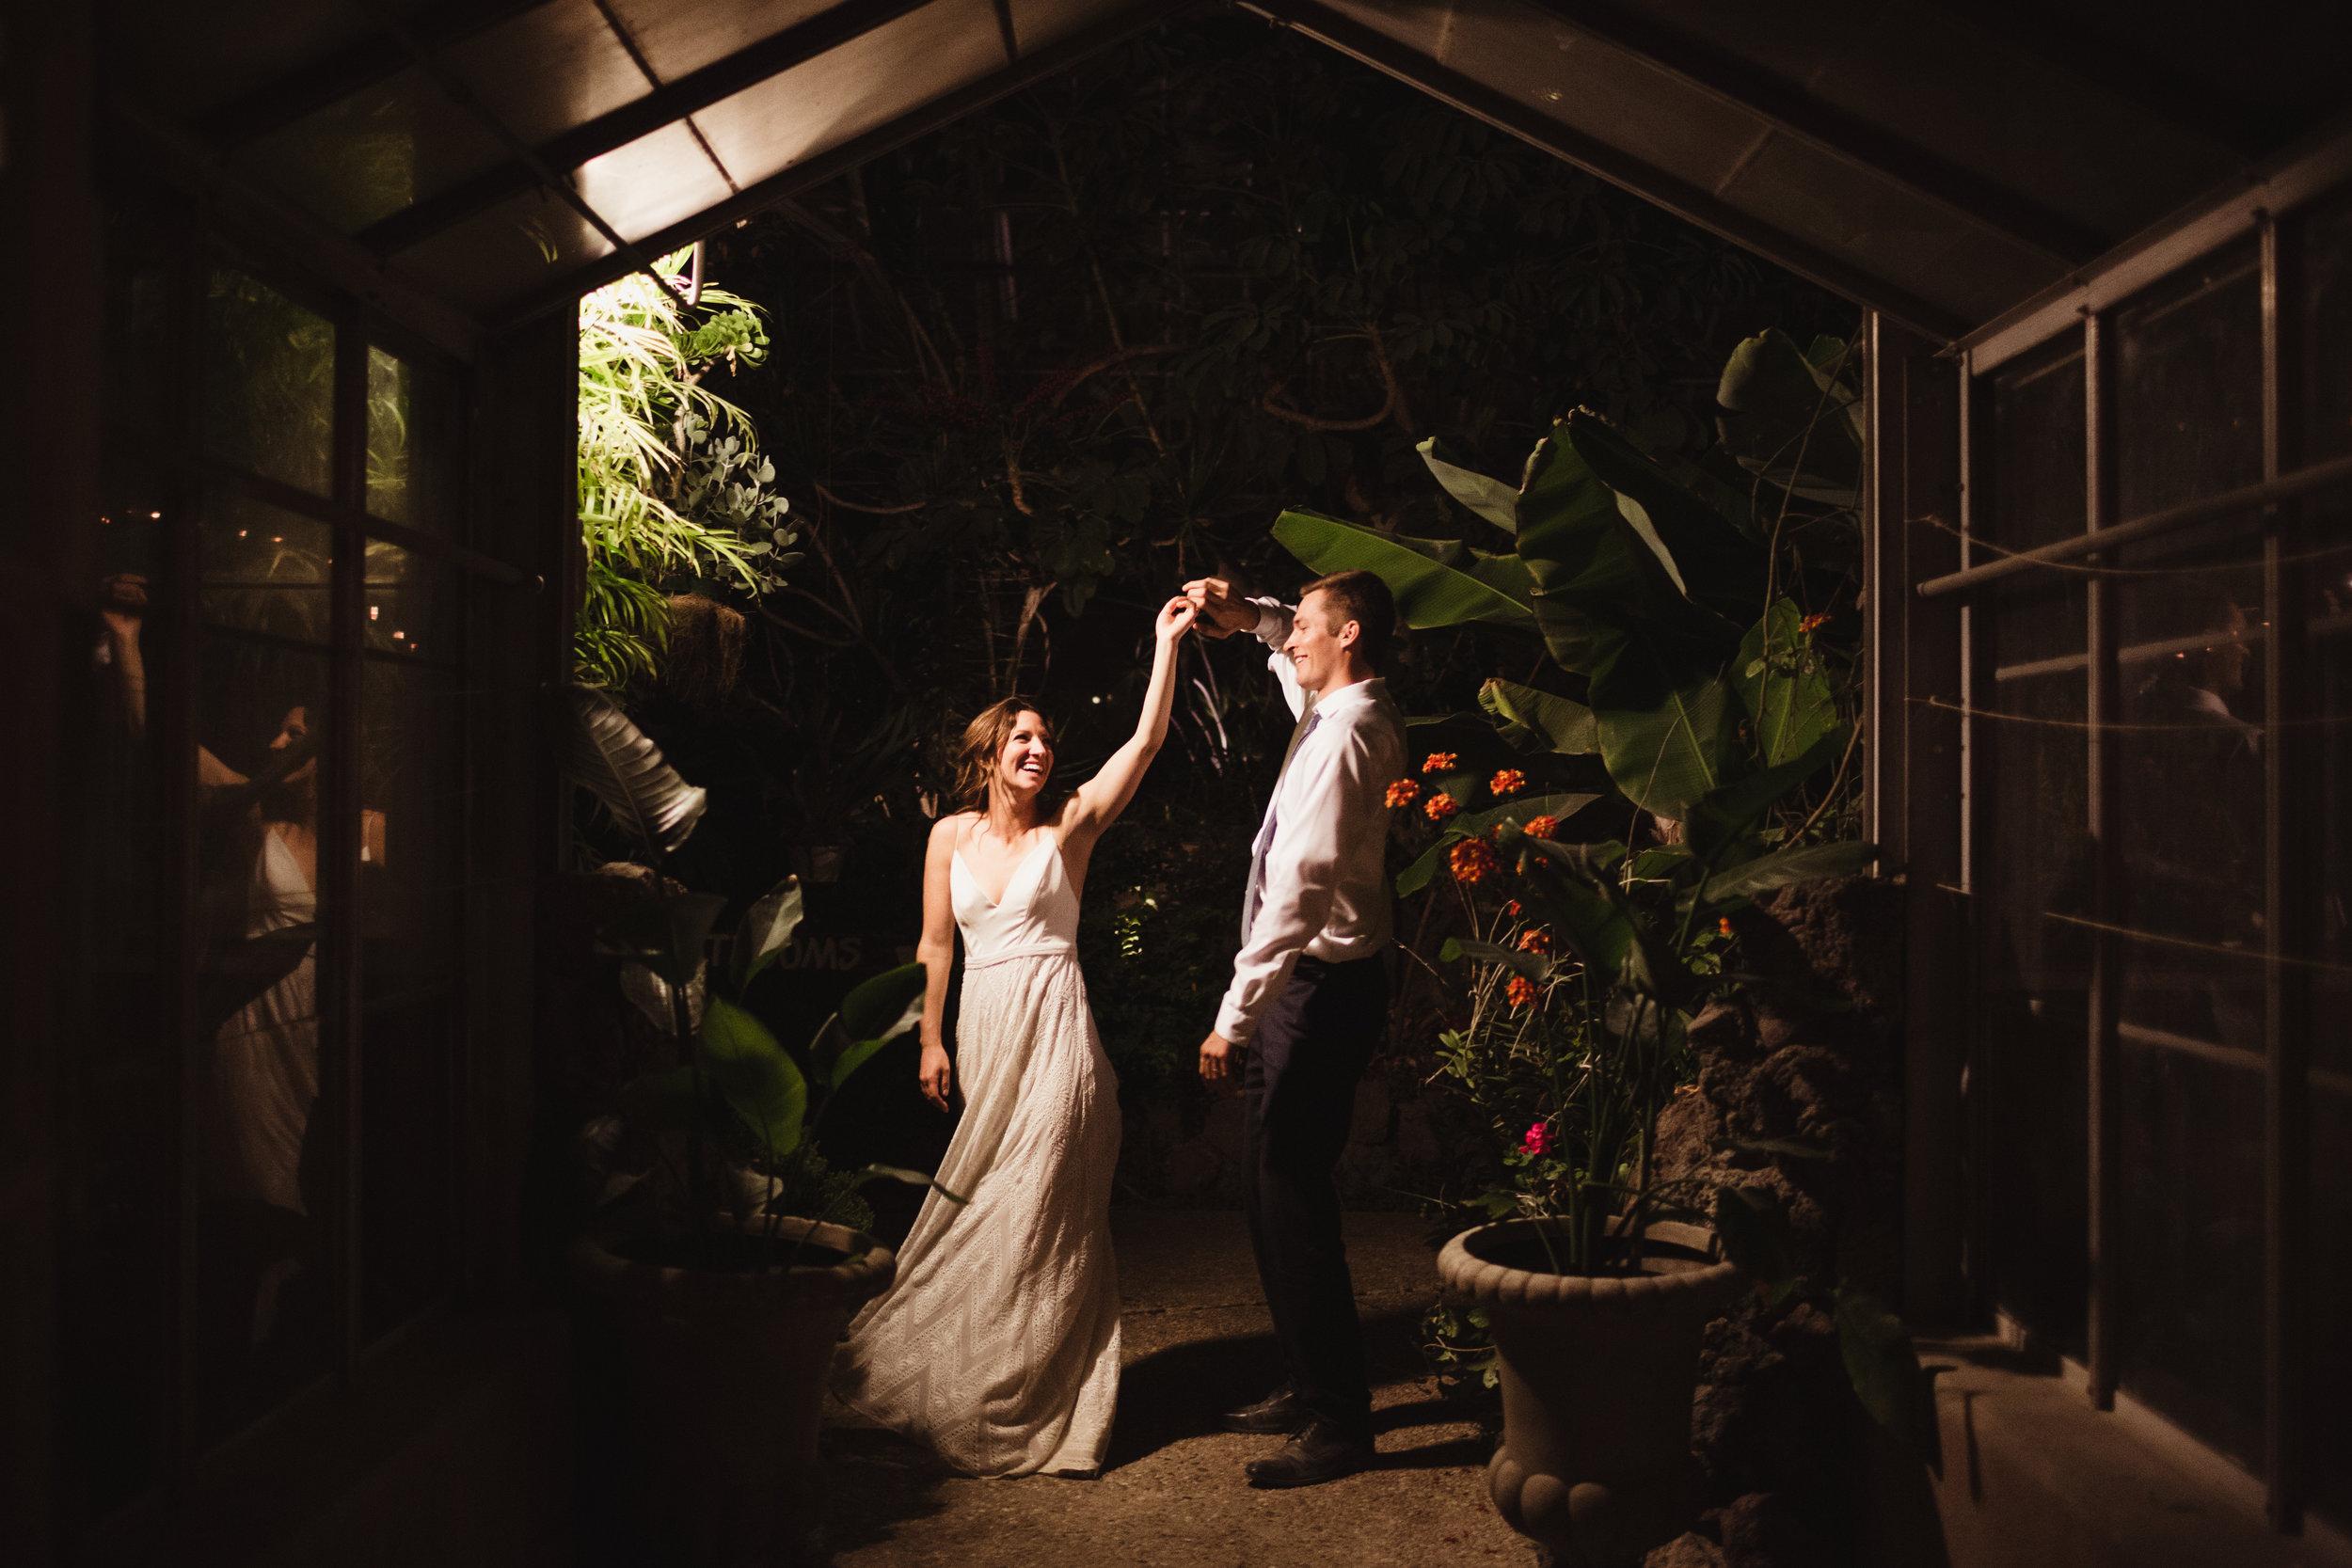 Jamie_English_Photography_JordanErik_Dos_Pueblos_Orchid_Wedding_Santa_Barbara_Fall2018-1325.jpg